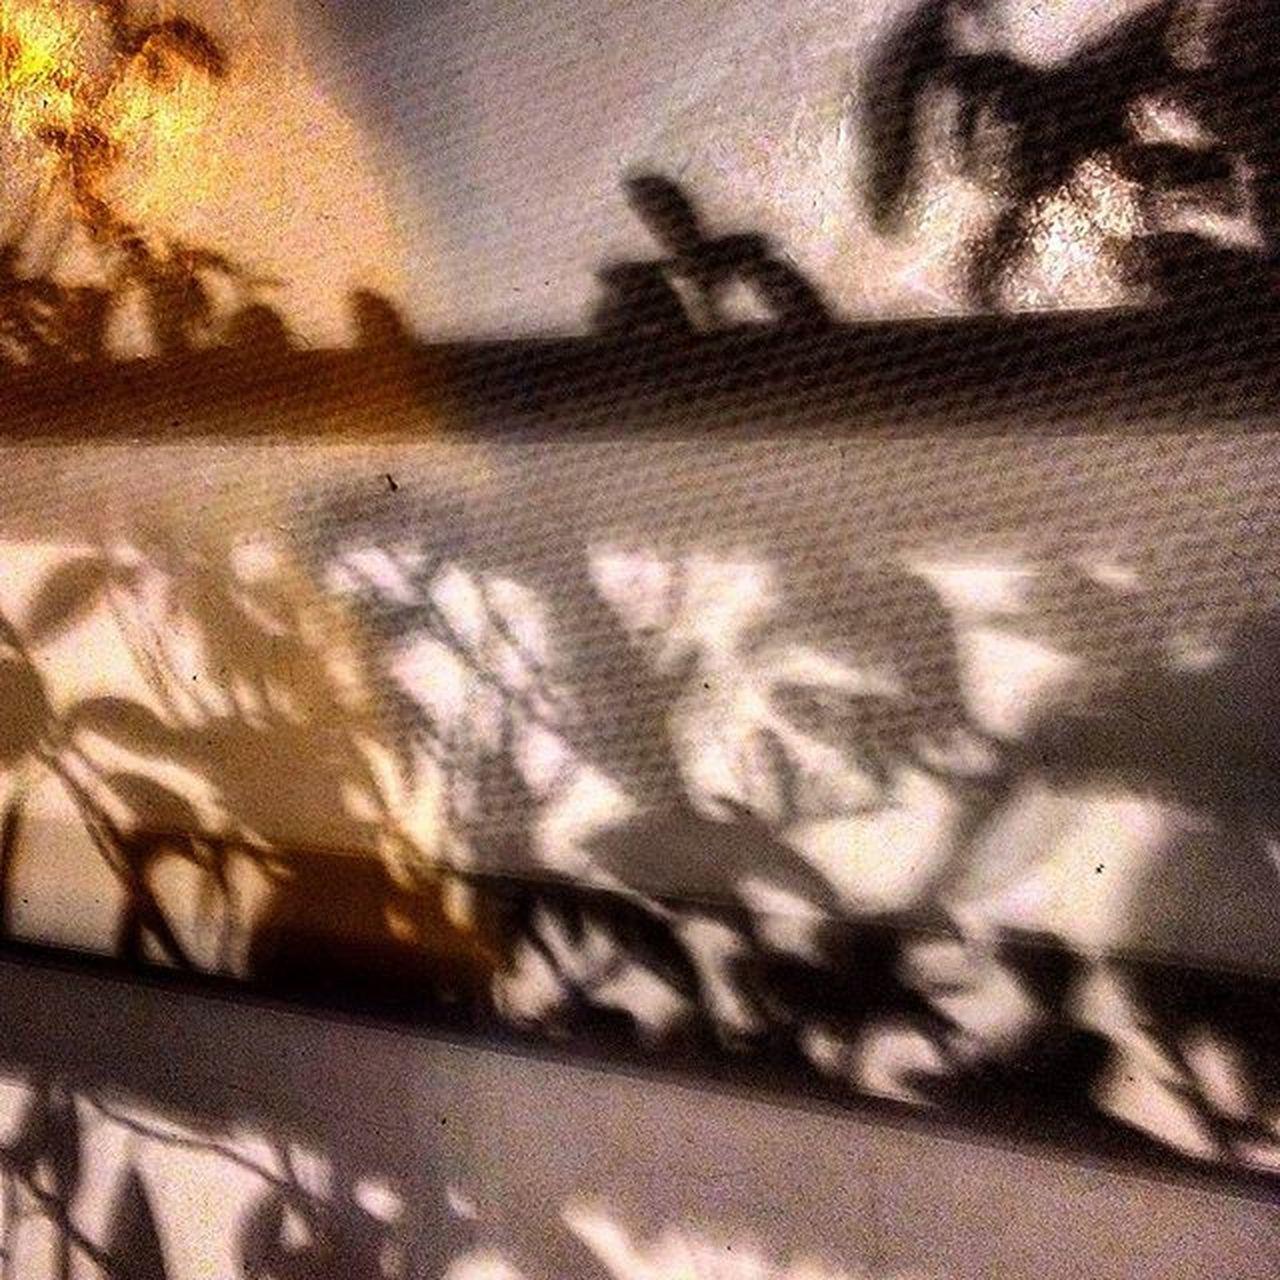 My LIFE is like a SHADOW belonging to the UNKNOWN but has many SECRETS HIDDEN deep within Shadow ShadowPhotoing MyShadowArt Trees_Shadowed ShadowMYstery Soi Streetsofindia Photography Photographer LateNightSnap D3300 Nikon Nikkor Nikonlove NikkorHeart Captivity MyCaputrvity Mydiaries LateNightDairies Igers_wanderlust MyWanderLust